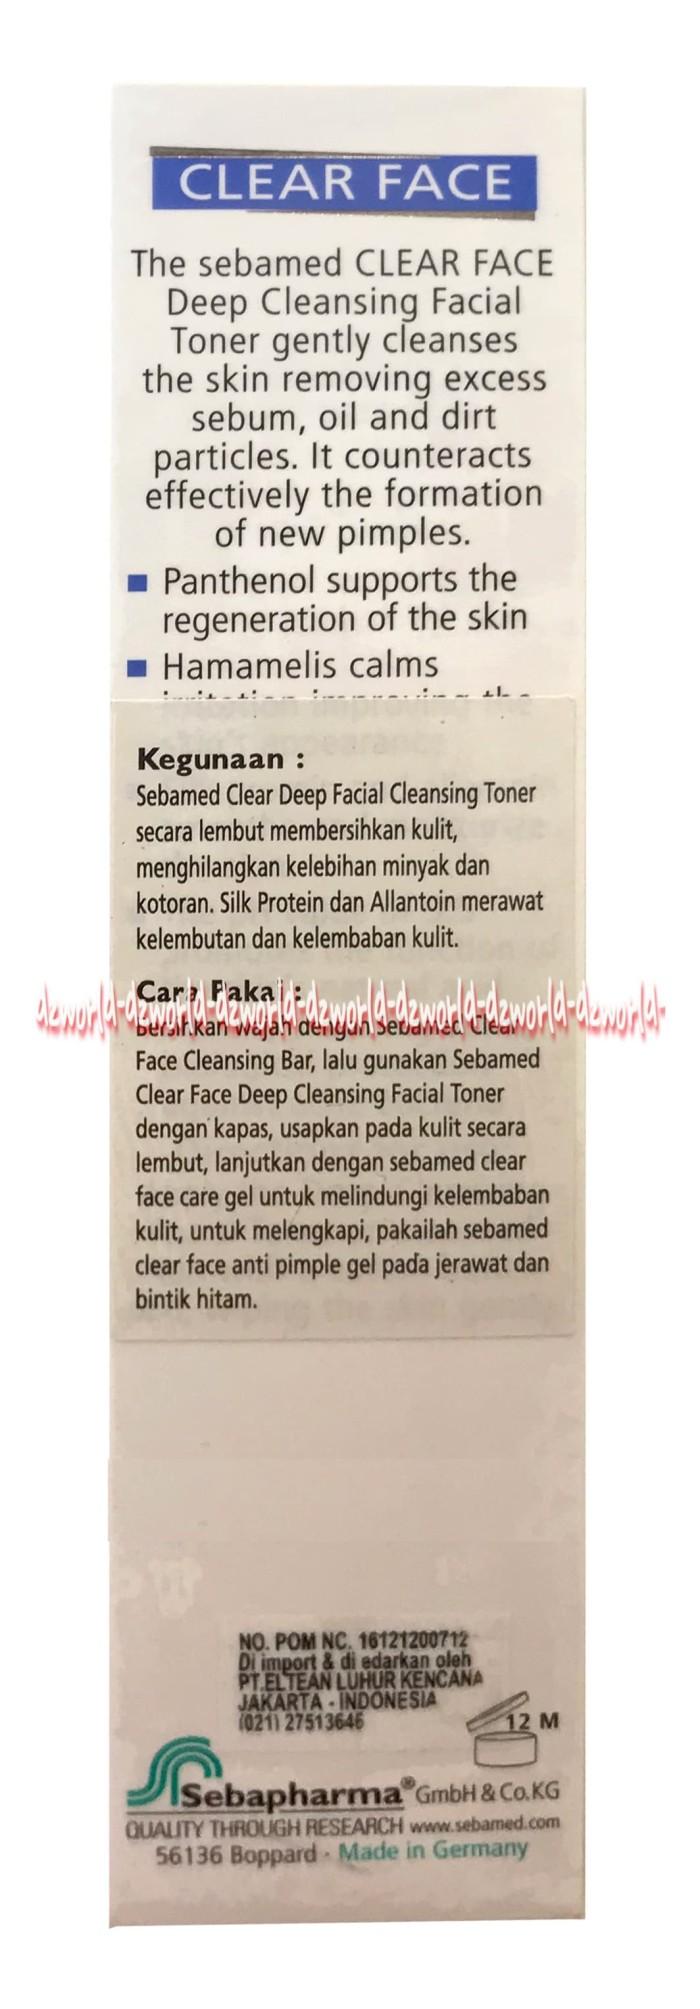 Sebamed Clear Face Deep Cleansing Facial Toner 150 Ml Pembersih Antibacterial Foam Wajah Anti Jerawat Komedo Kotor 150ml Seba Med